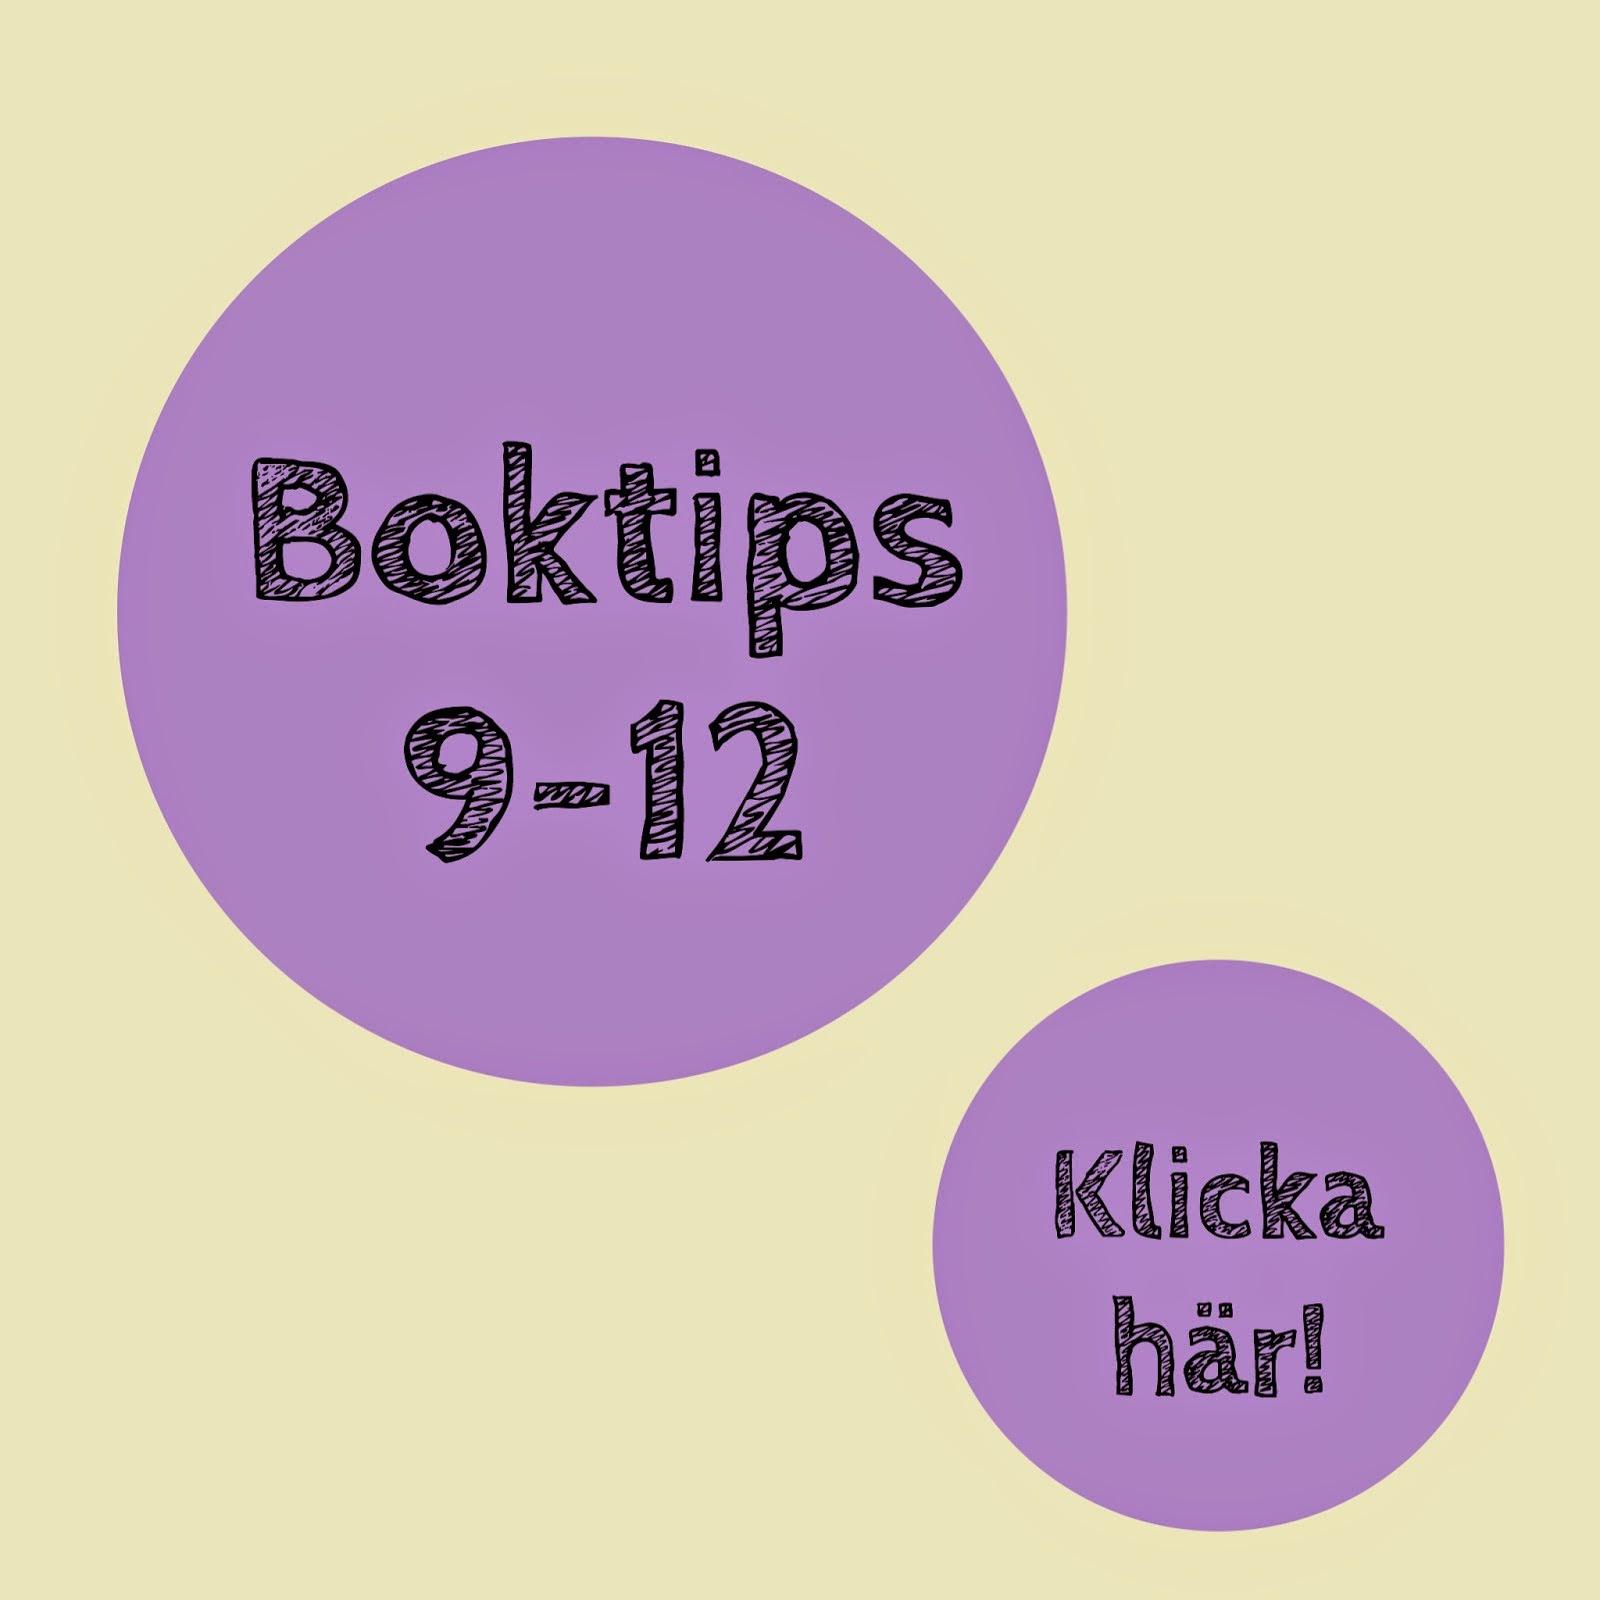 Boktips 9-12